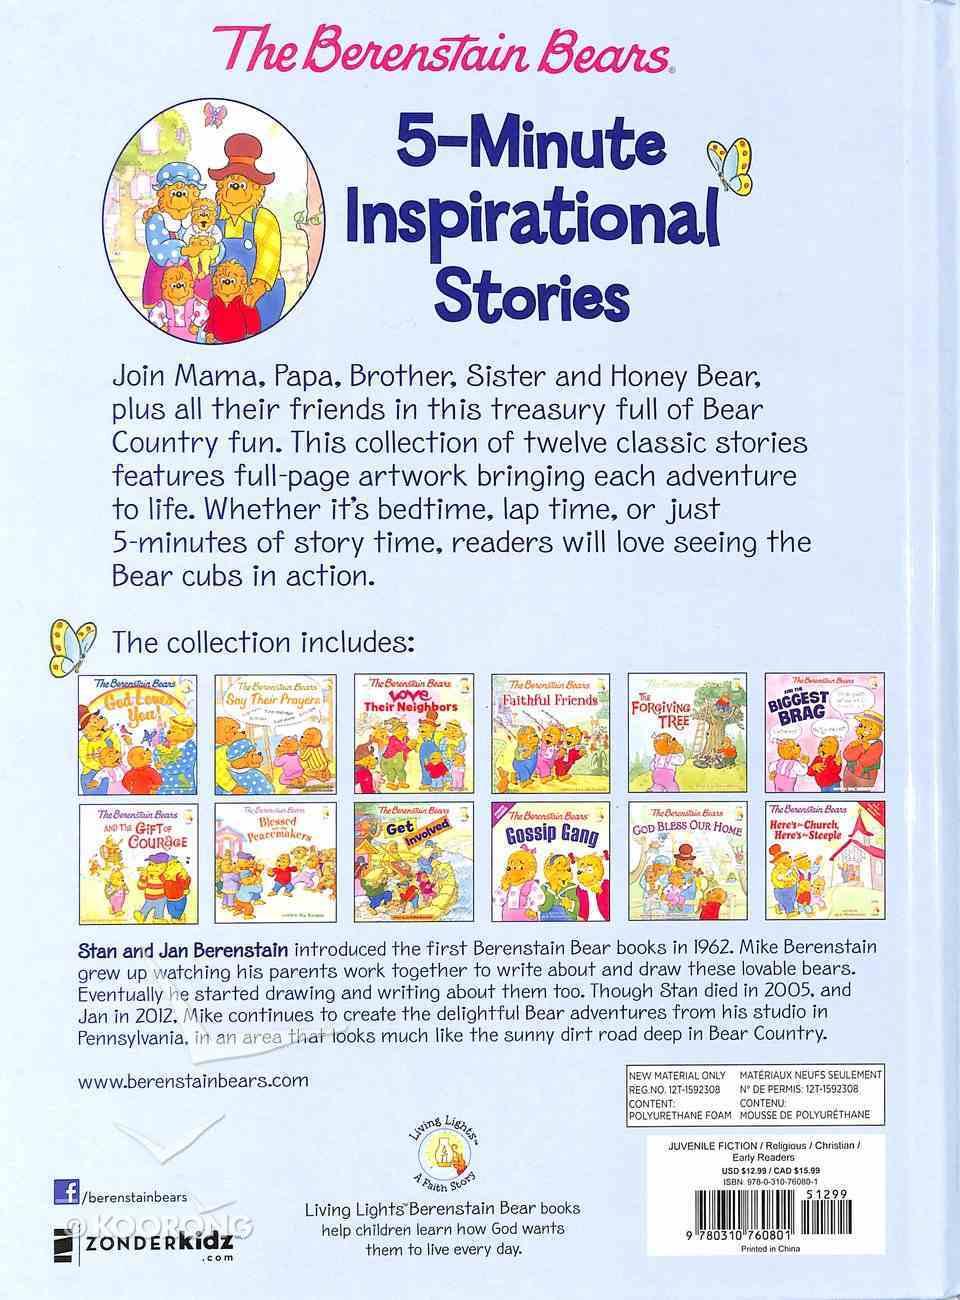 5-Minute Inspirational Stories (The Berenstain Bears Series) Hardback